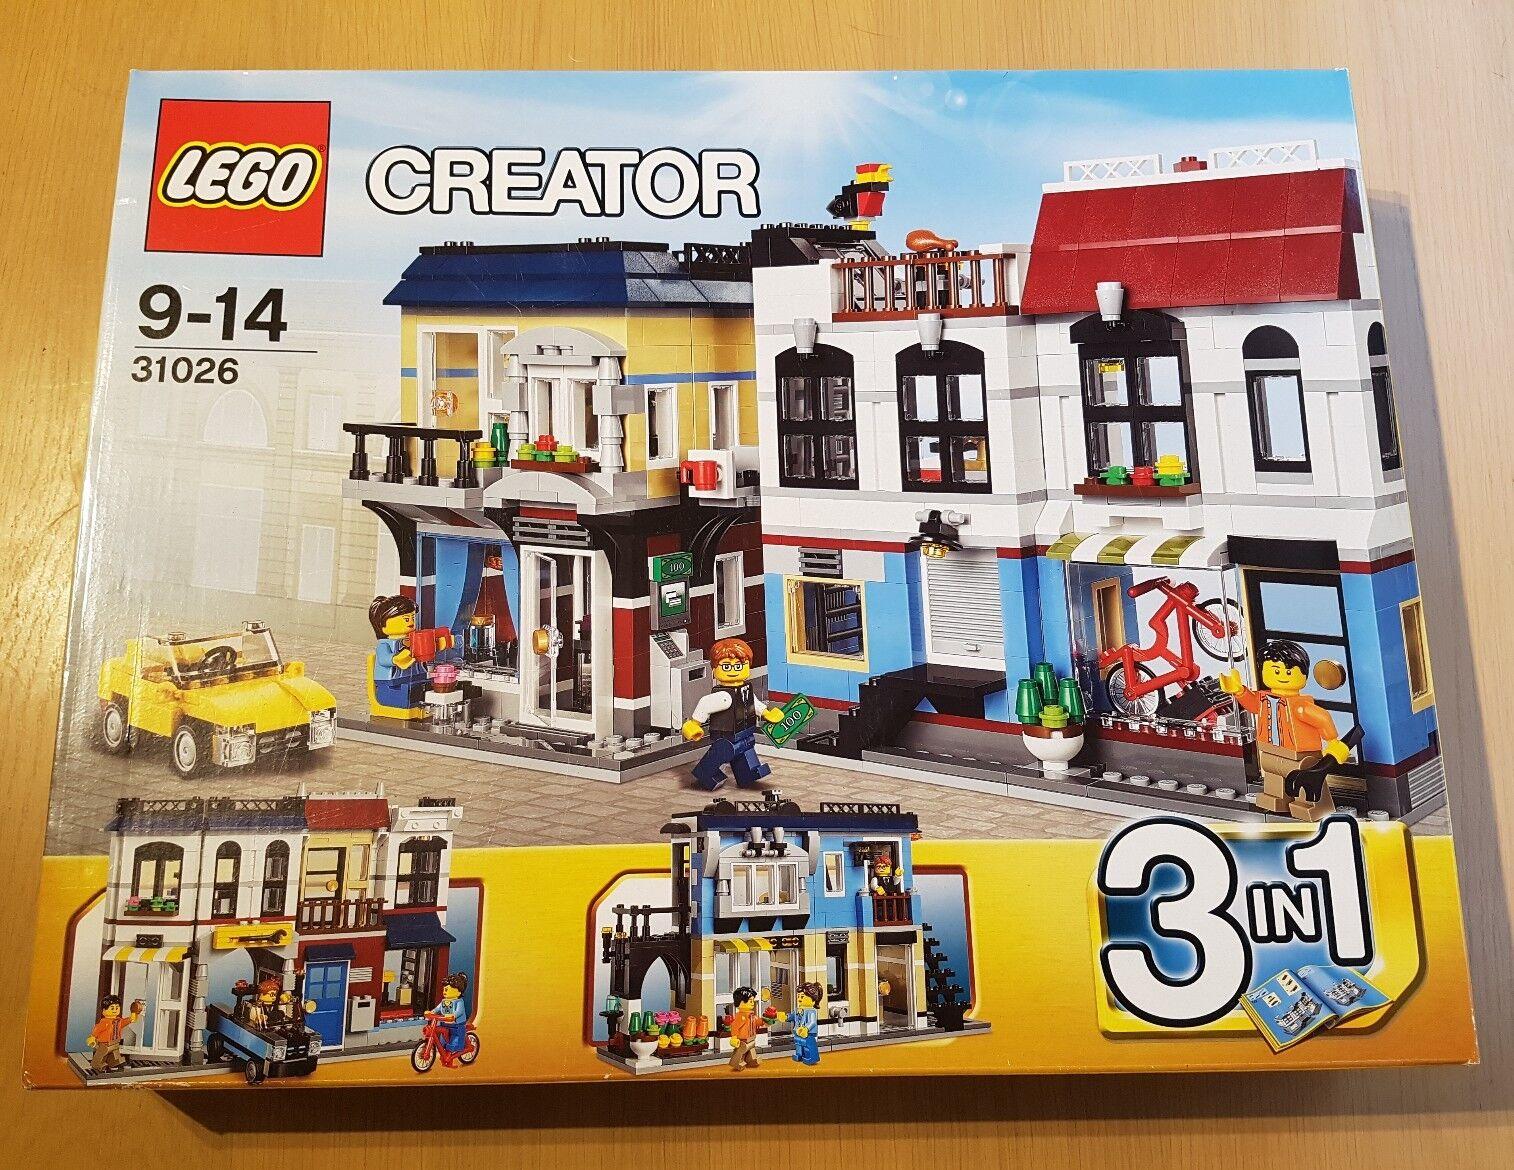 LEGO 31026 Creator Bike Shop & Cafe 3 in 1 NEW FACTORY SEALED BOX Retirot Set